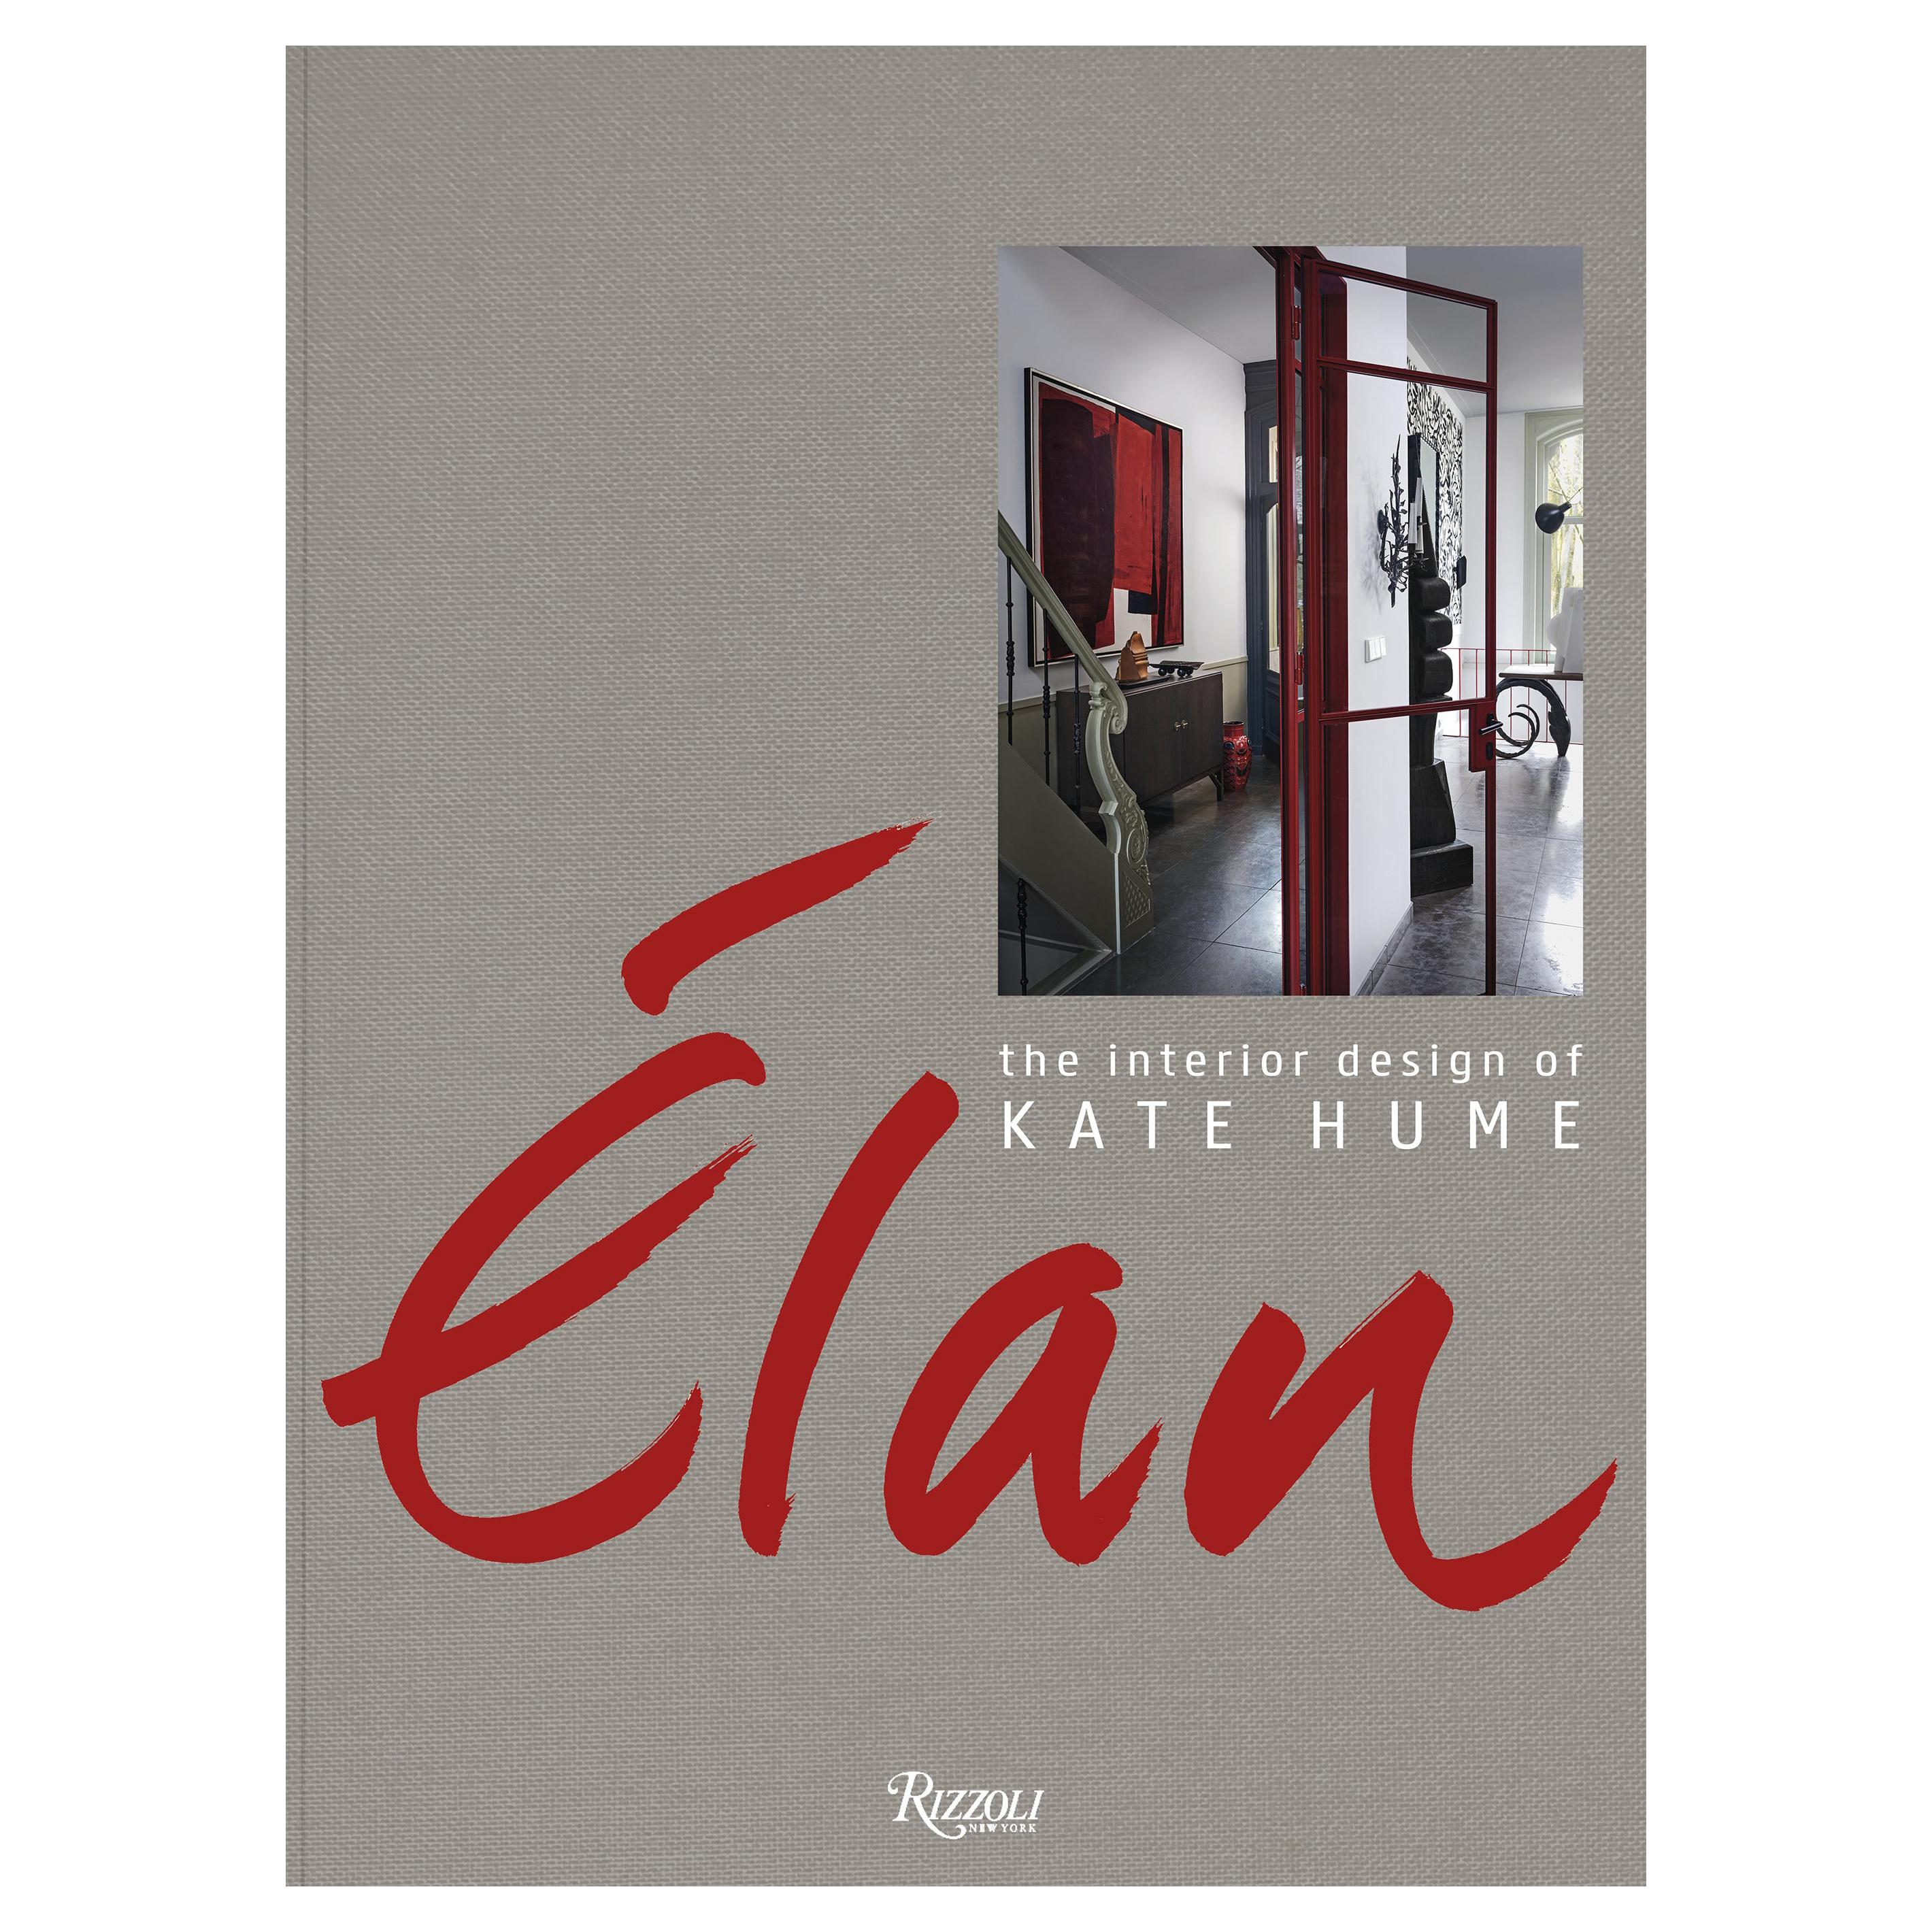 Elan The Interior Design of Kate Hume